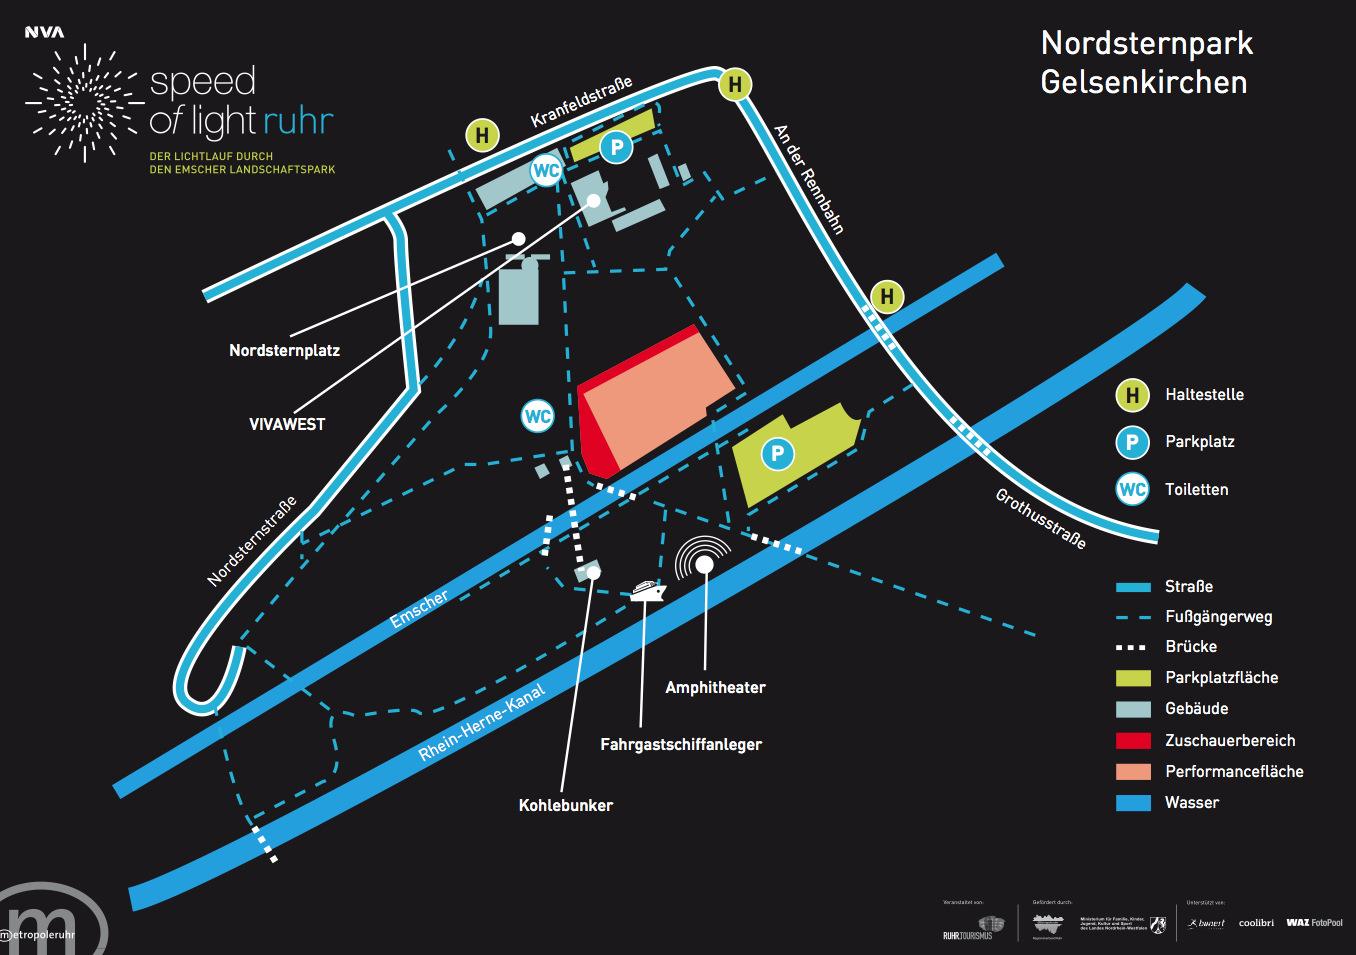 Nordsternpark Gelsenkirchen Speed of Light Ruhr Ruhrgebiet NVA nvasol